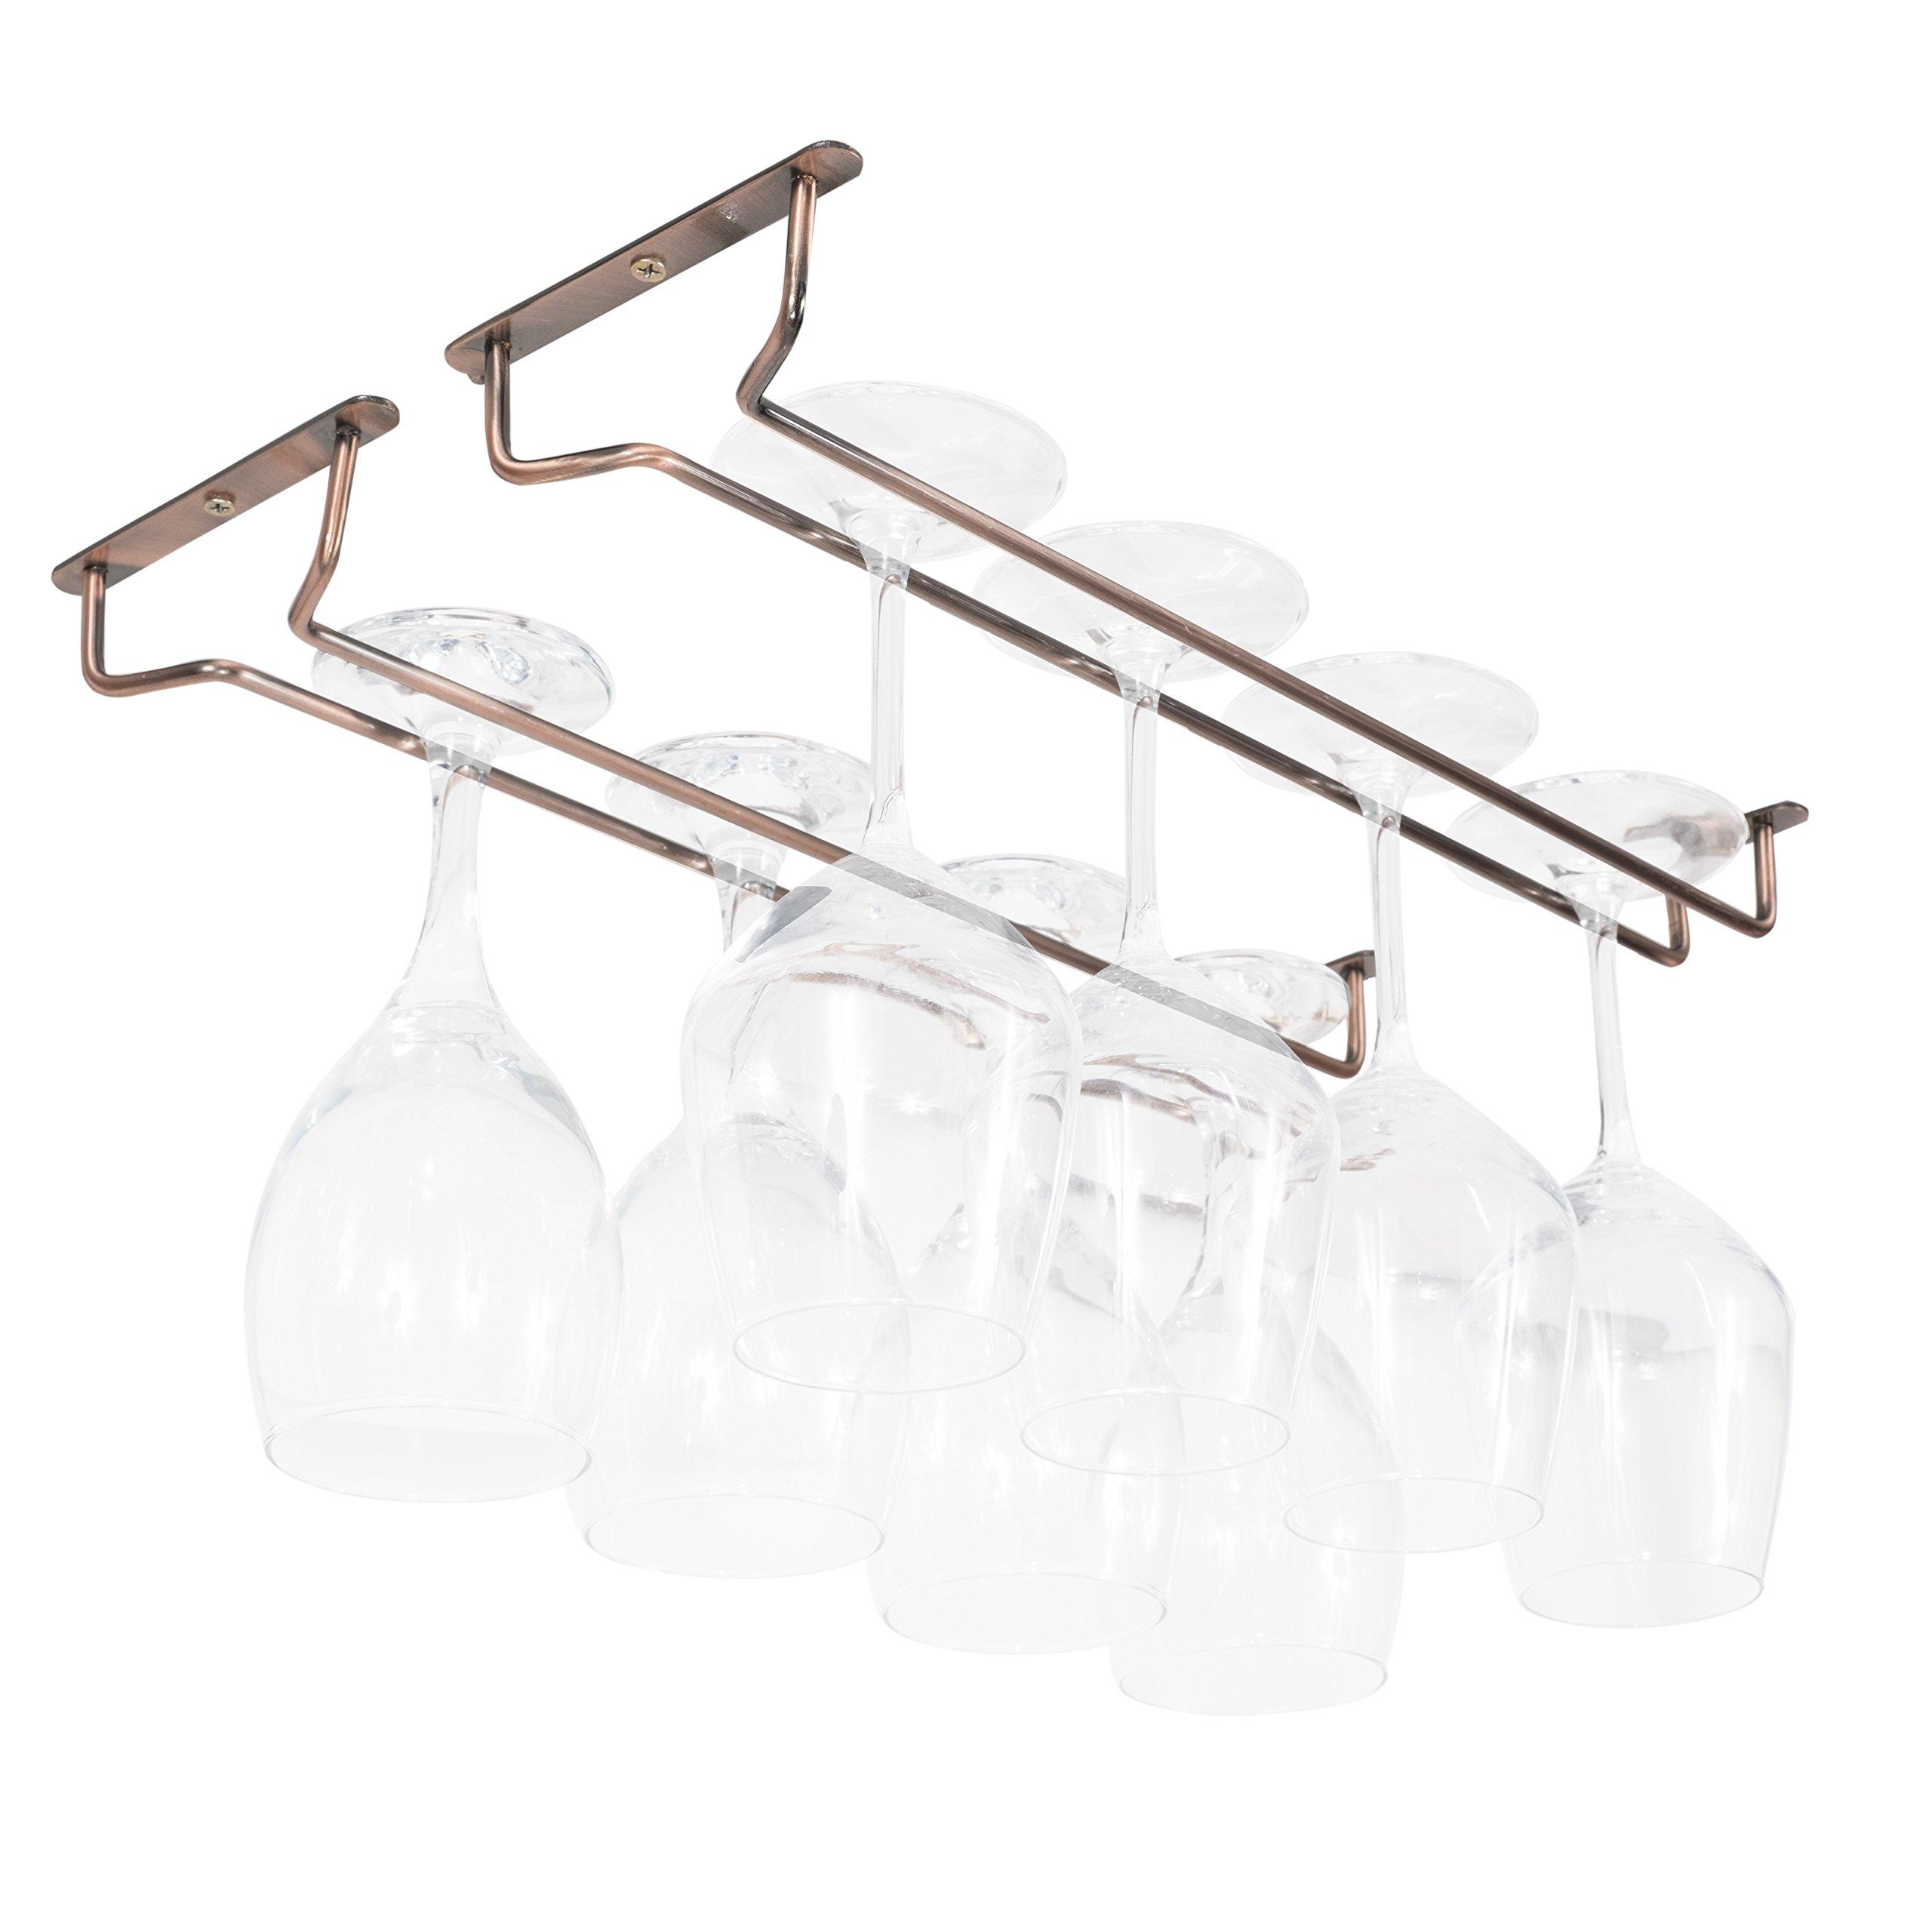 Wallniture Wine Glasses Holder - Under Cabinet Stemware Rack - Steel Oil Rubbed Finish 17 Inch Set of 2